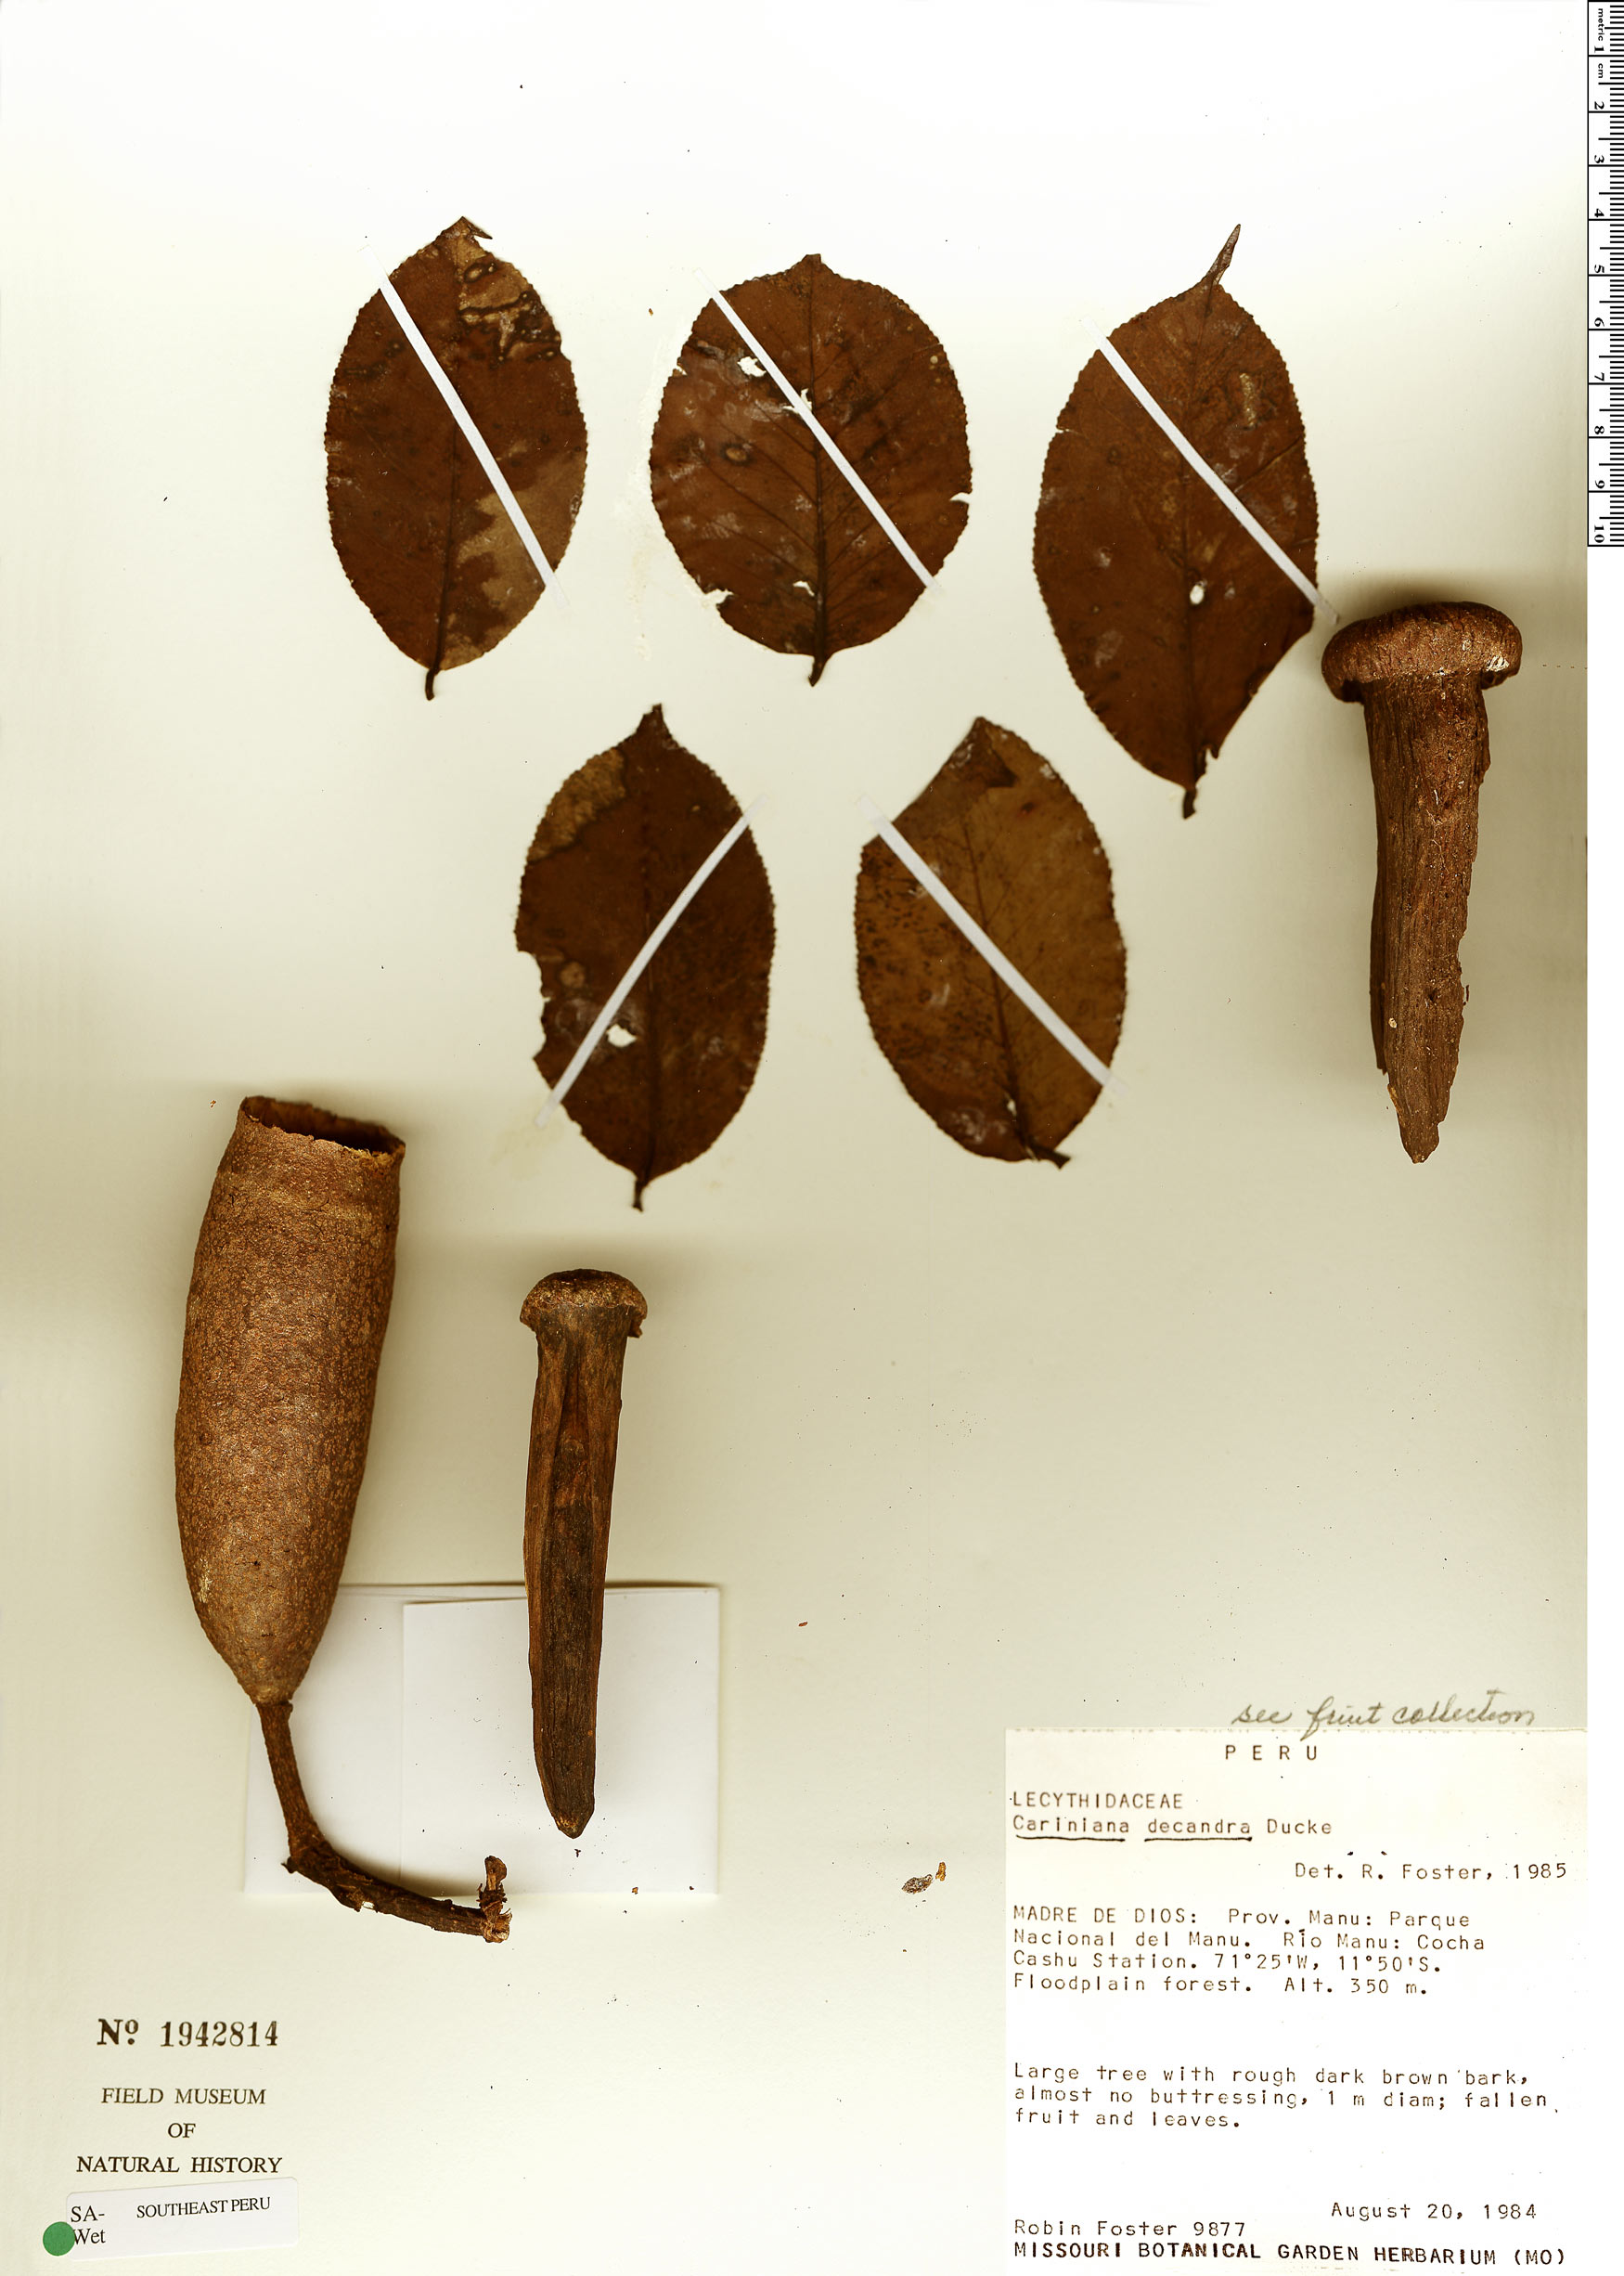 Specimen: Cariniana estrellensis